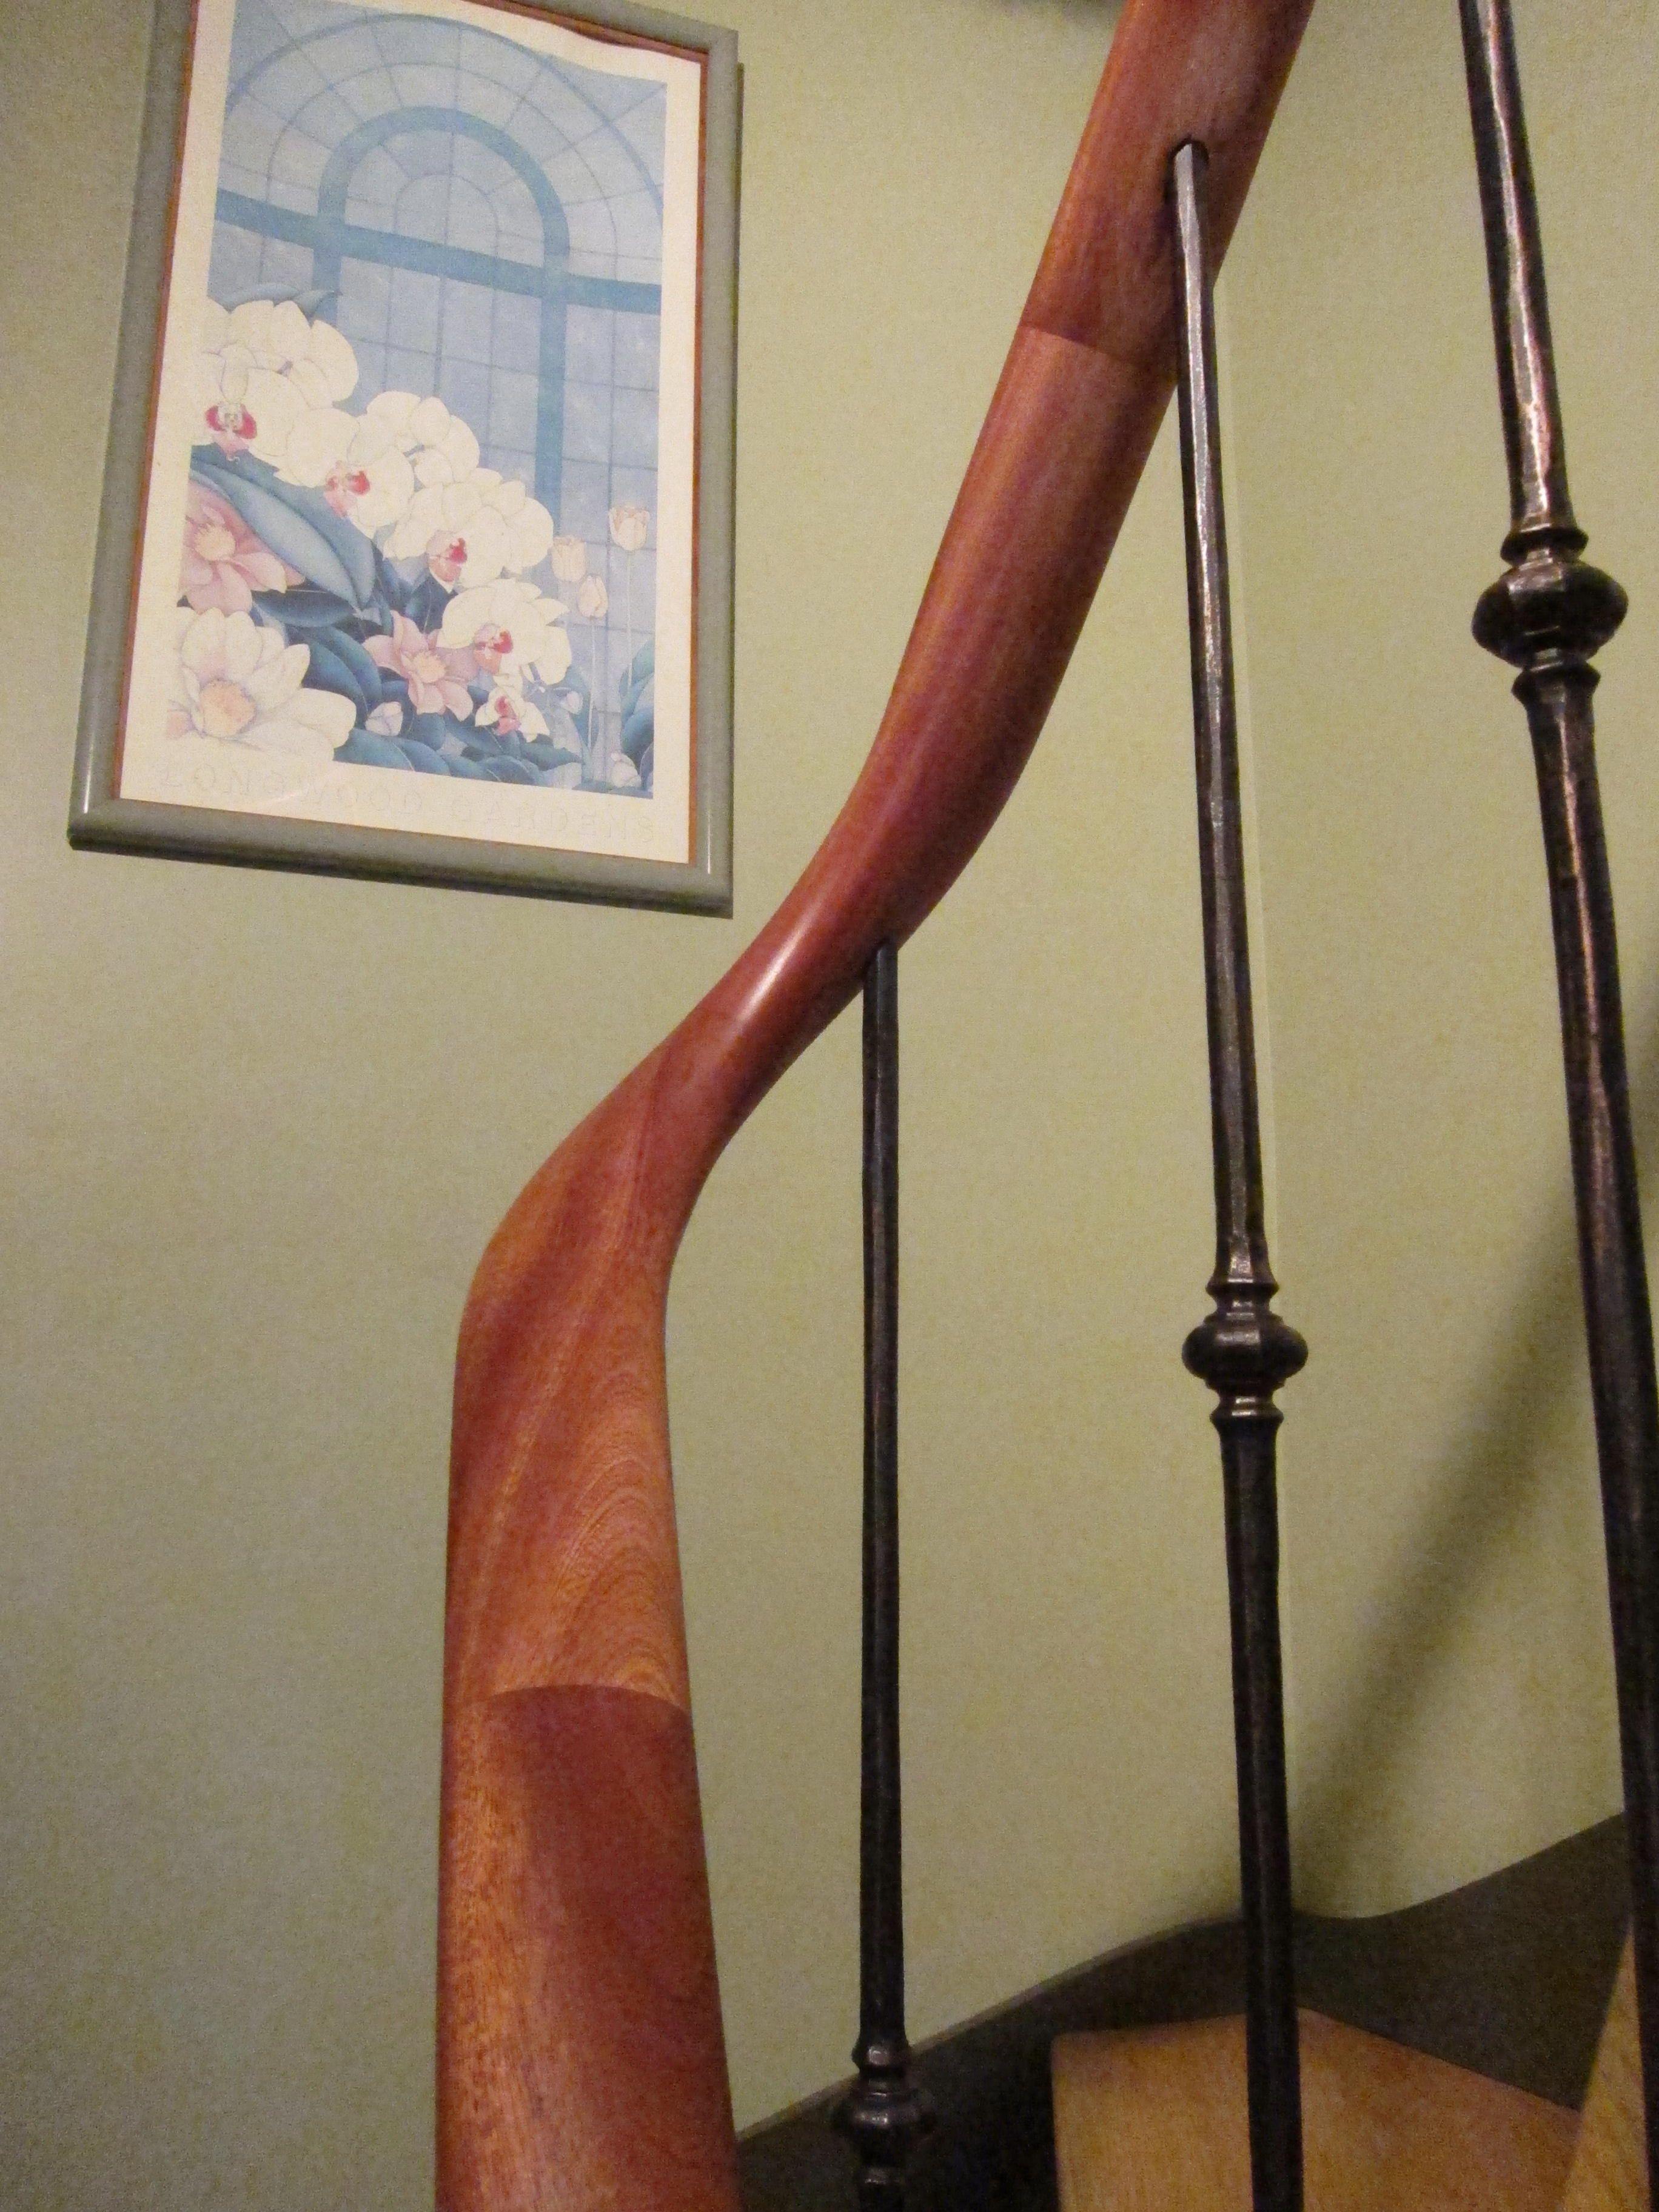 Best Wreath Handrail Custom Handrail Wood Handrail Handrail 640 x 480